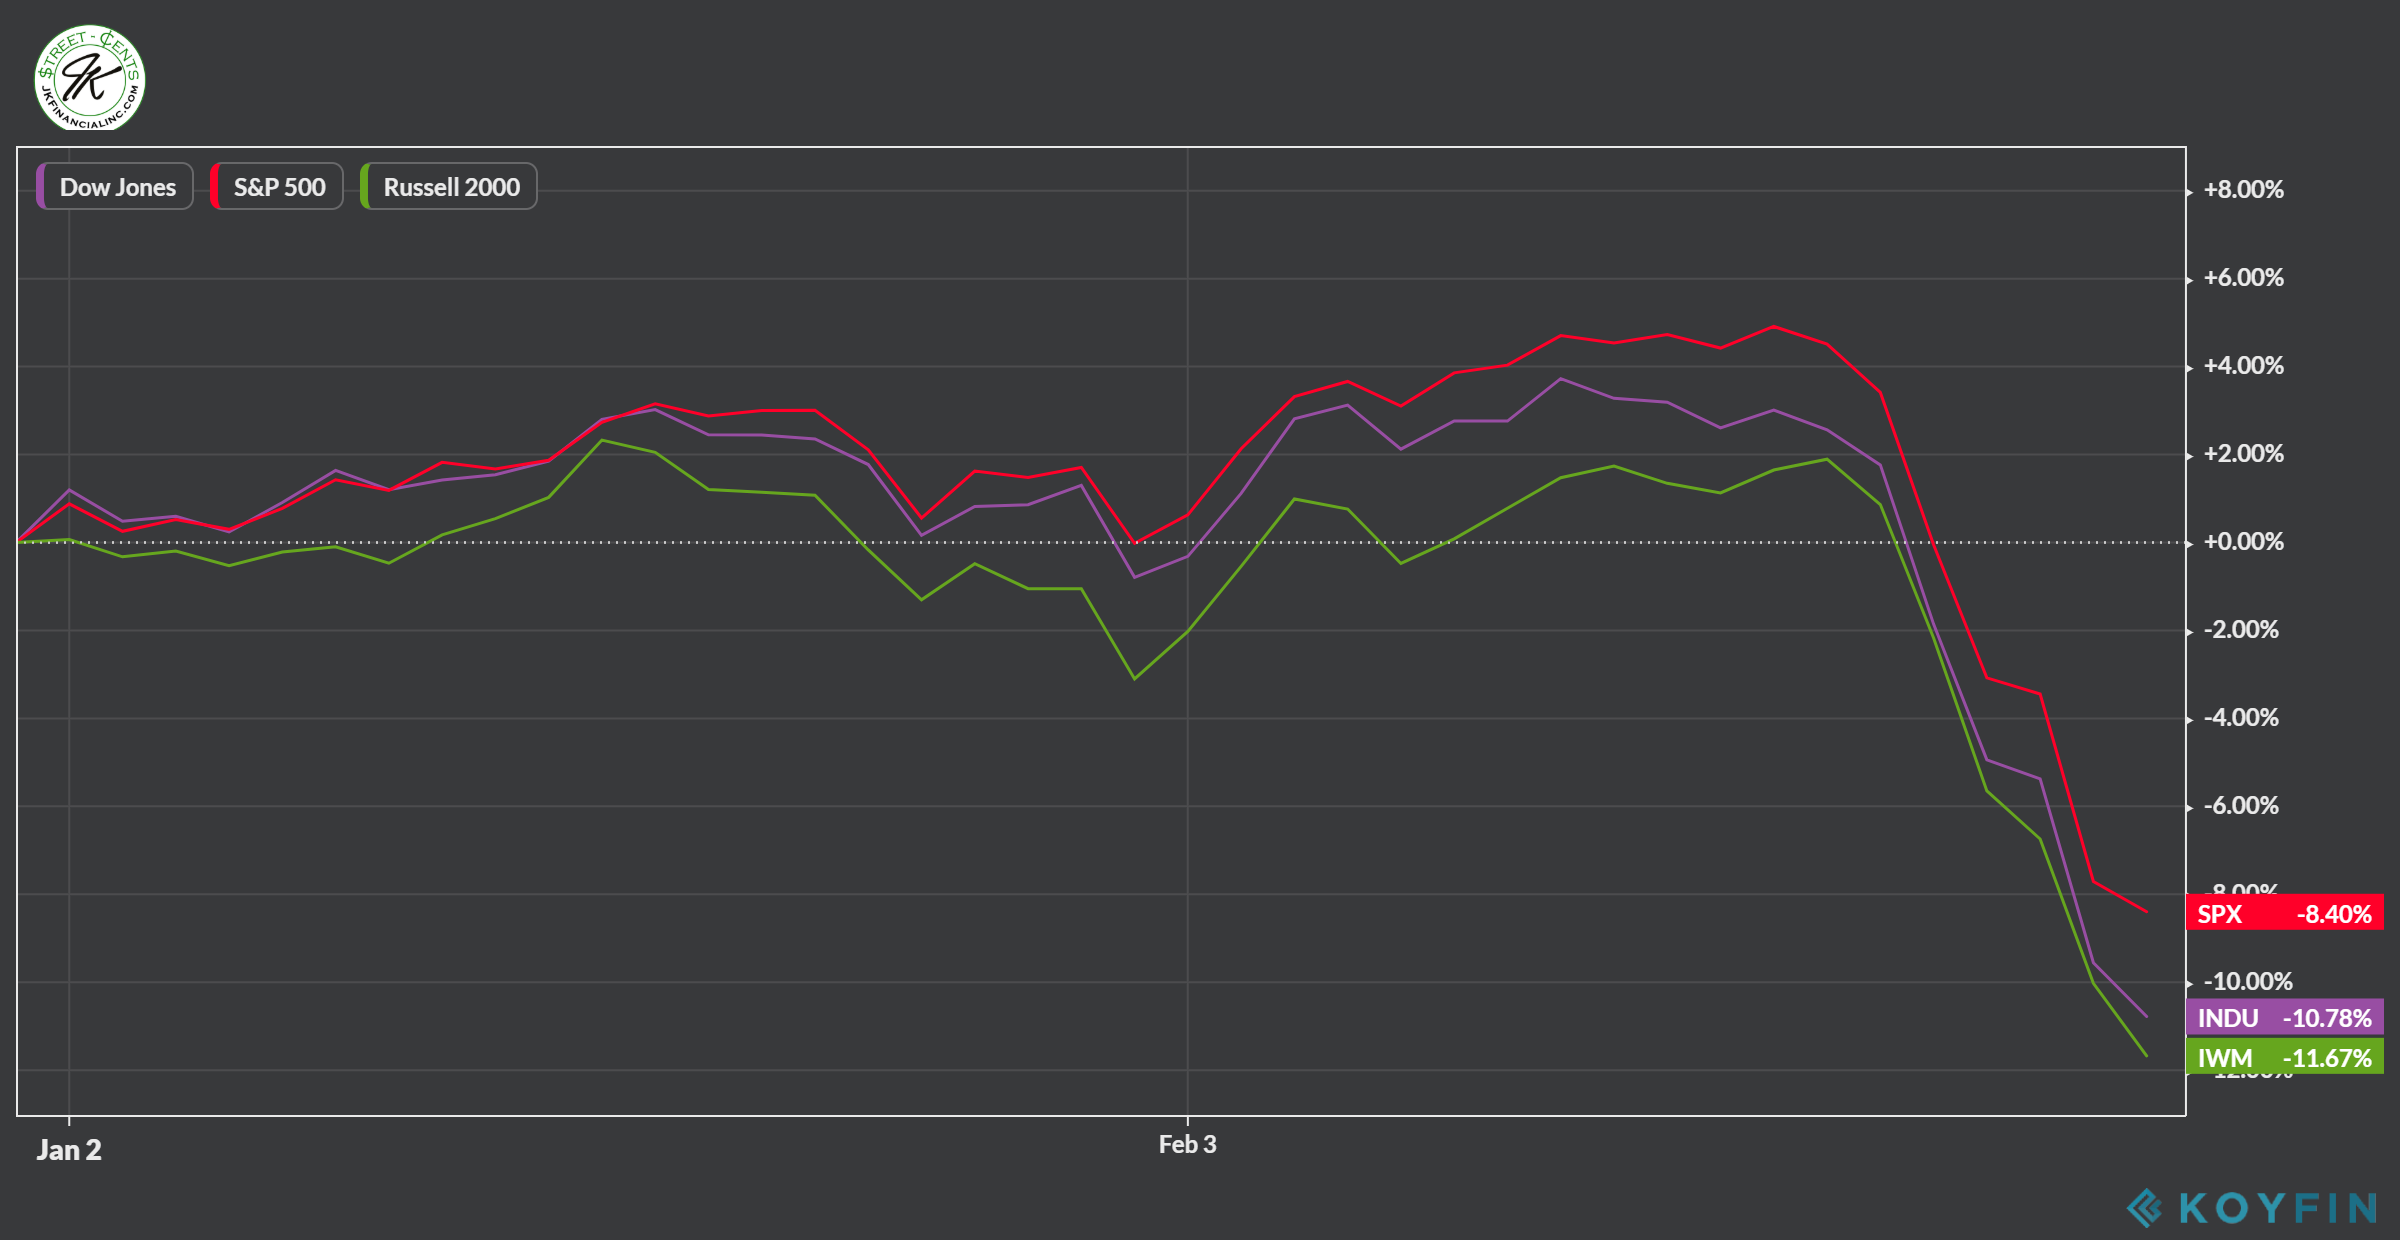 3-1-20 YTD Index Returns